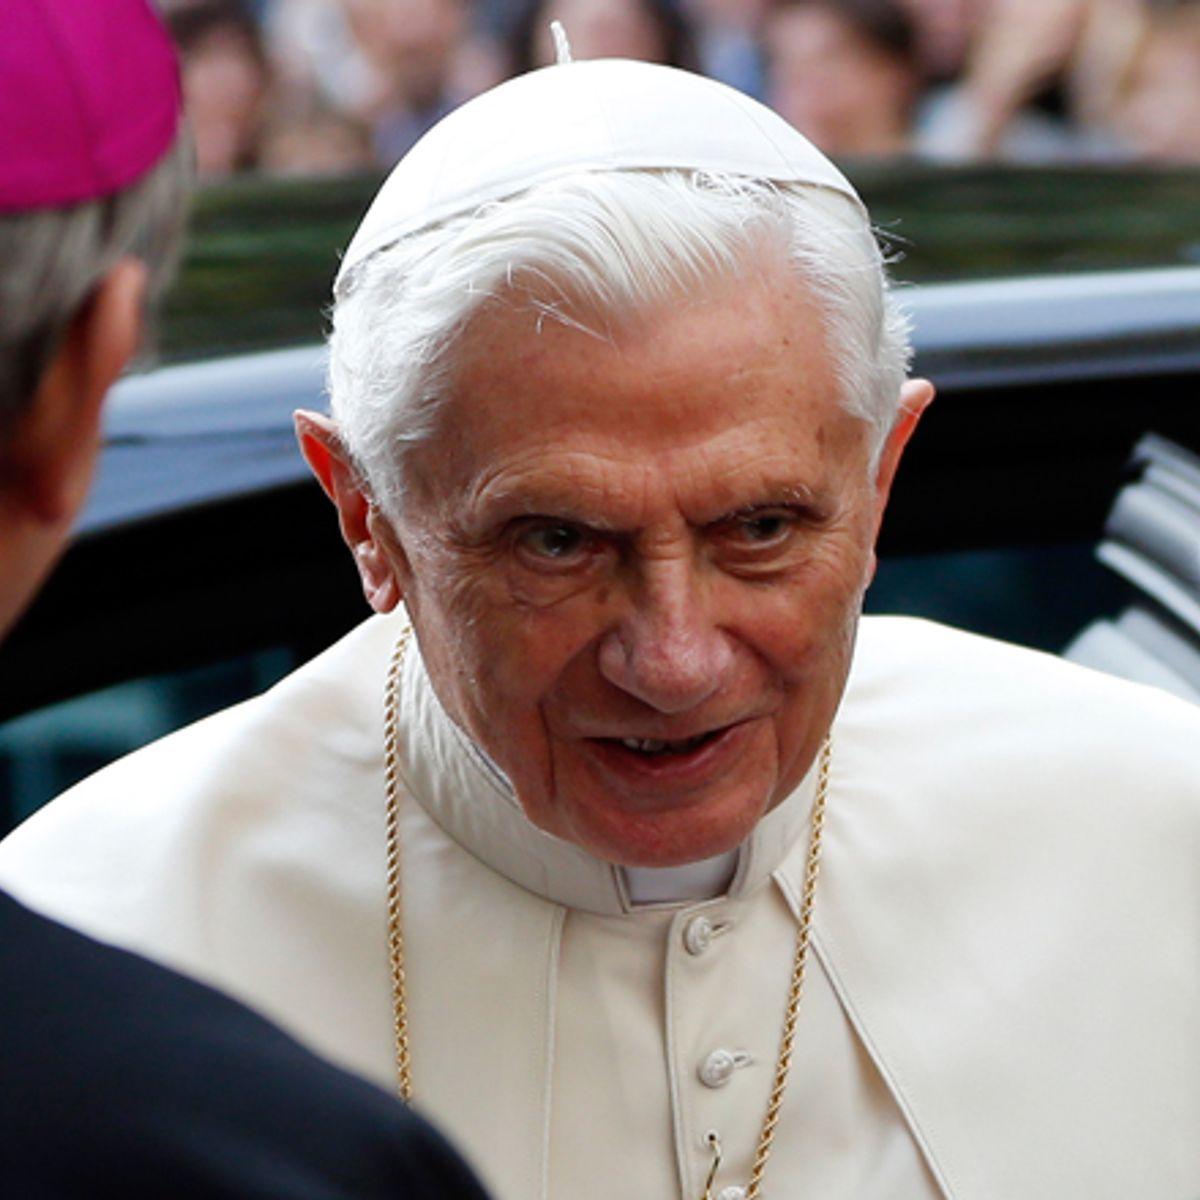 Papal election 2021 betting odds jjb irish cup betting advice